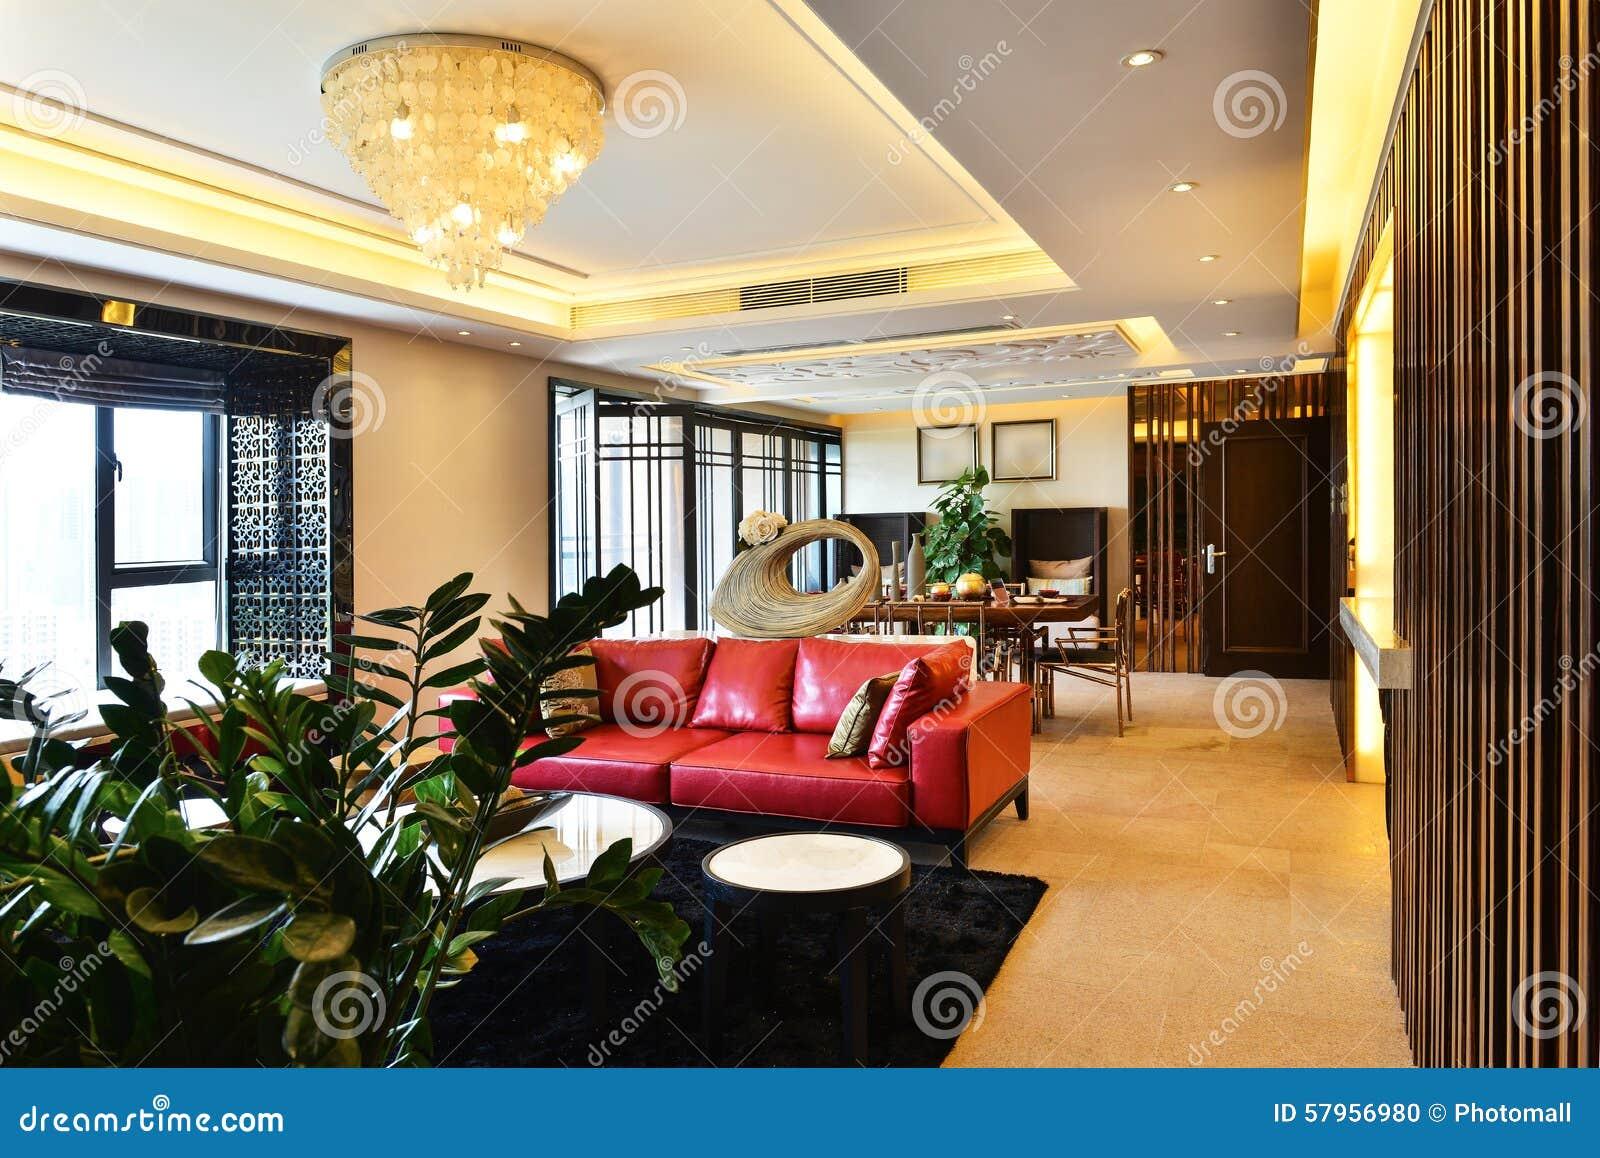 Modern Luxury Living Room Room Stock Photo Image 57956980